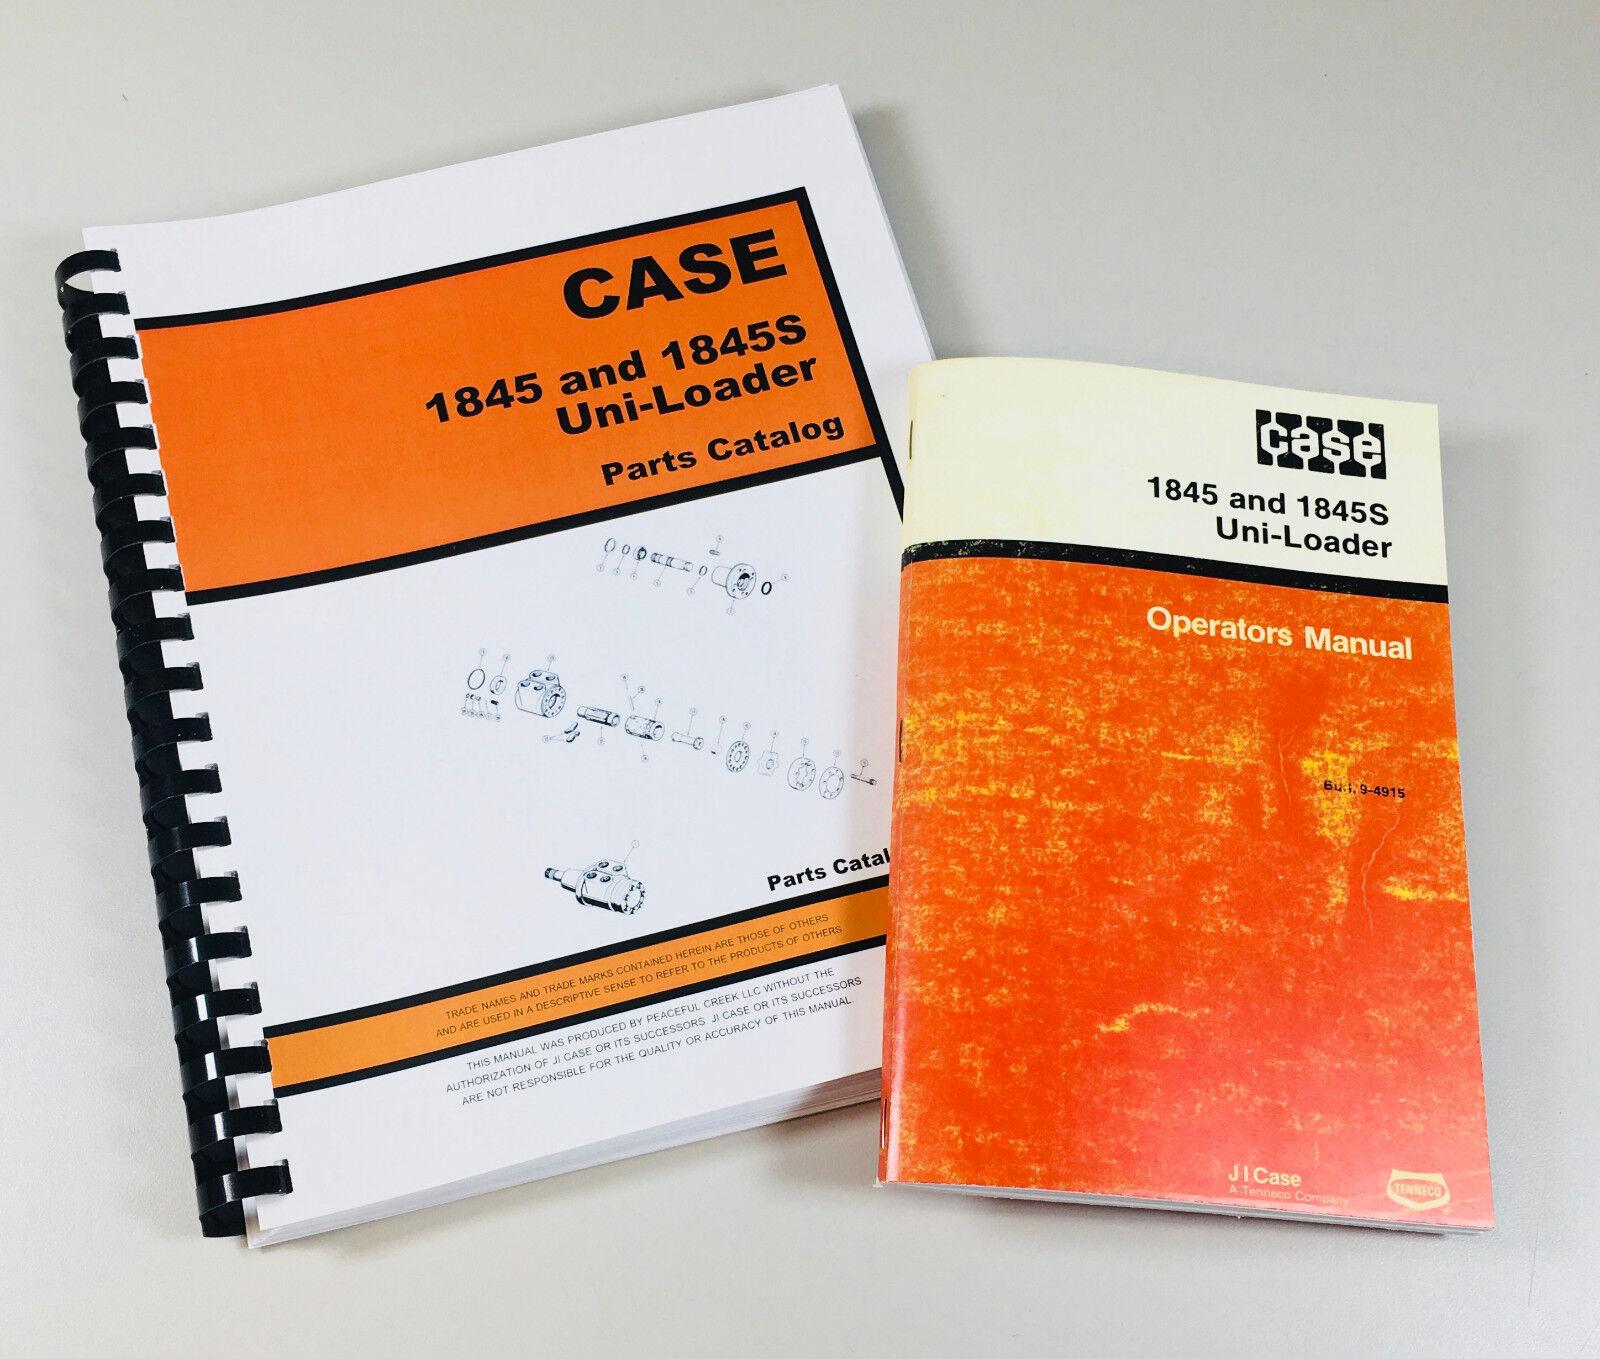 Complete Parts and Operators Manuals